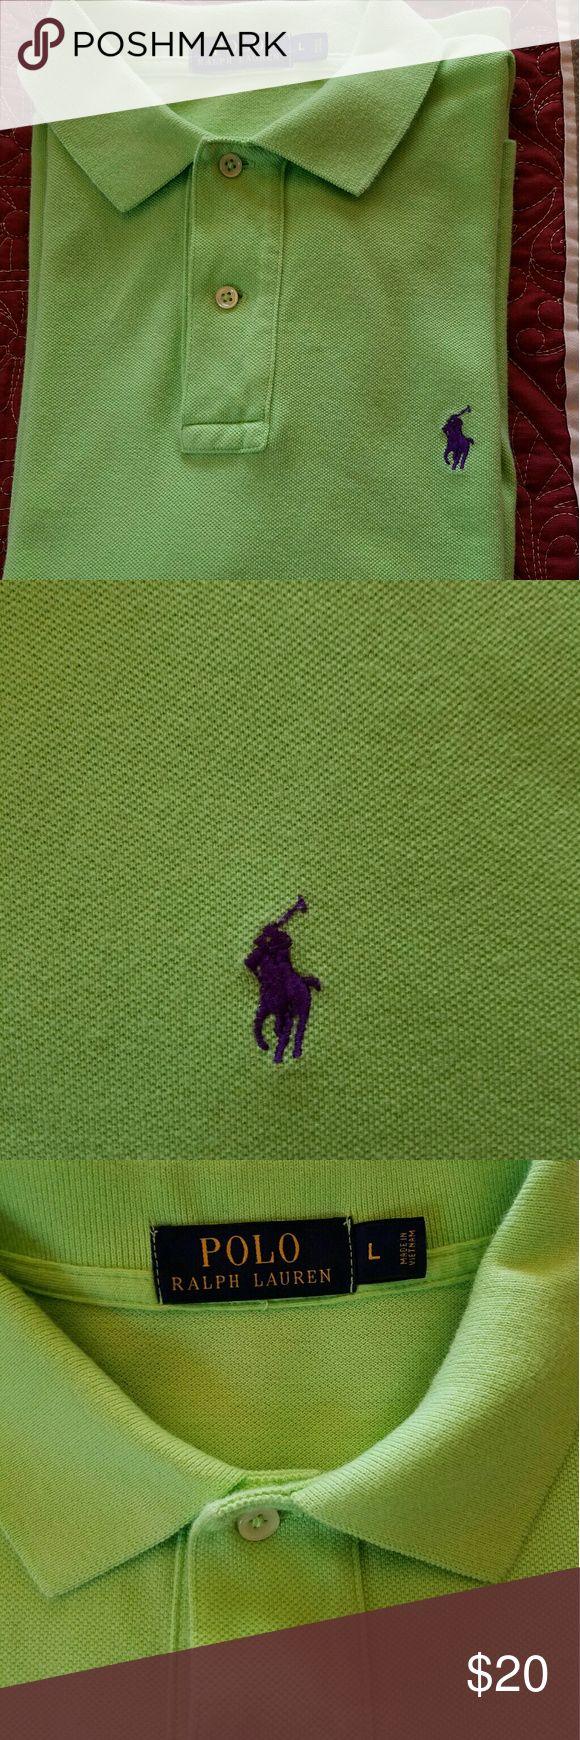 Ralph Lauren Polo shirt Lime green Polo Shirt with purple Polo logo Ralph Lauren Shirts Polos